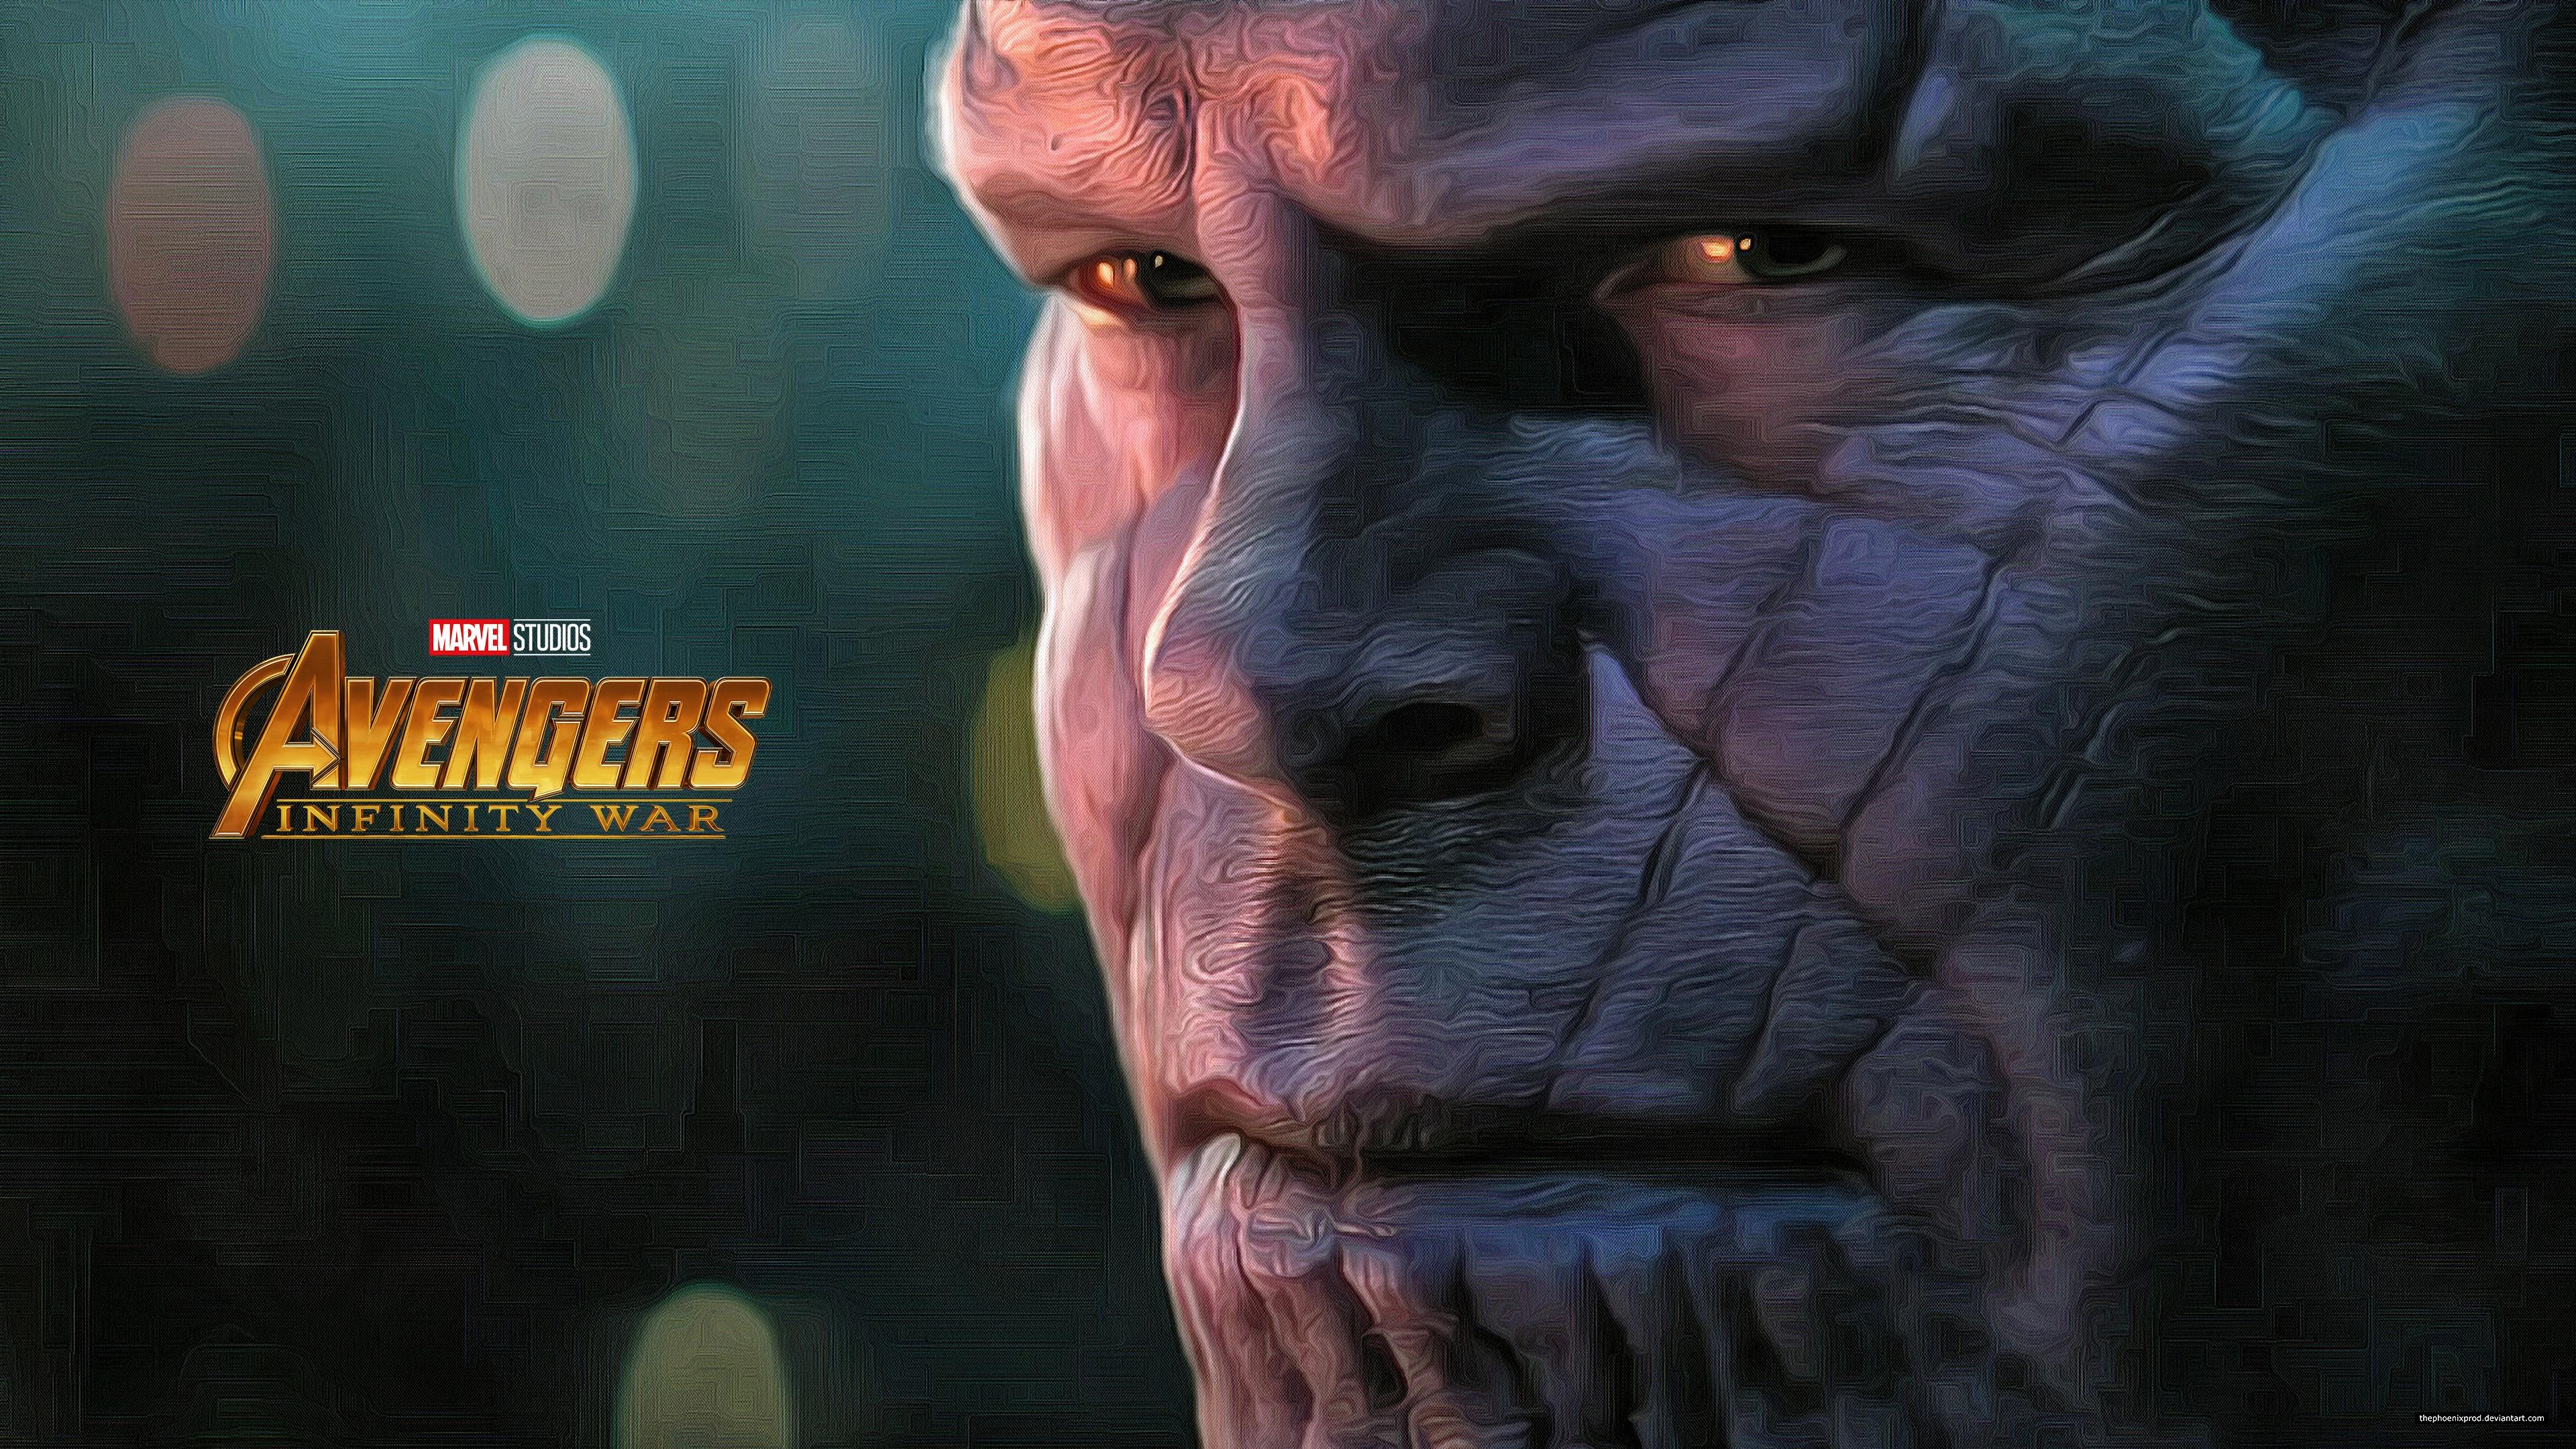 thanos avengers infinity war 4k 1547507381 - Thanos Avengers: Infinity War 4K - Thanos, Avengers Infinity War